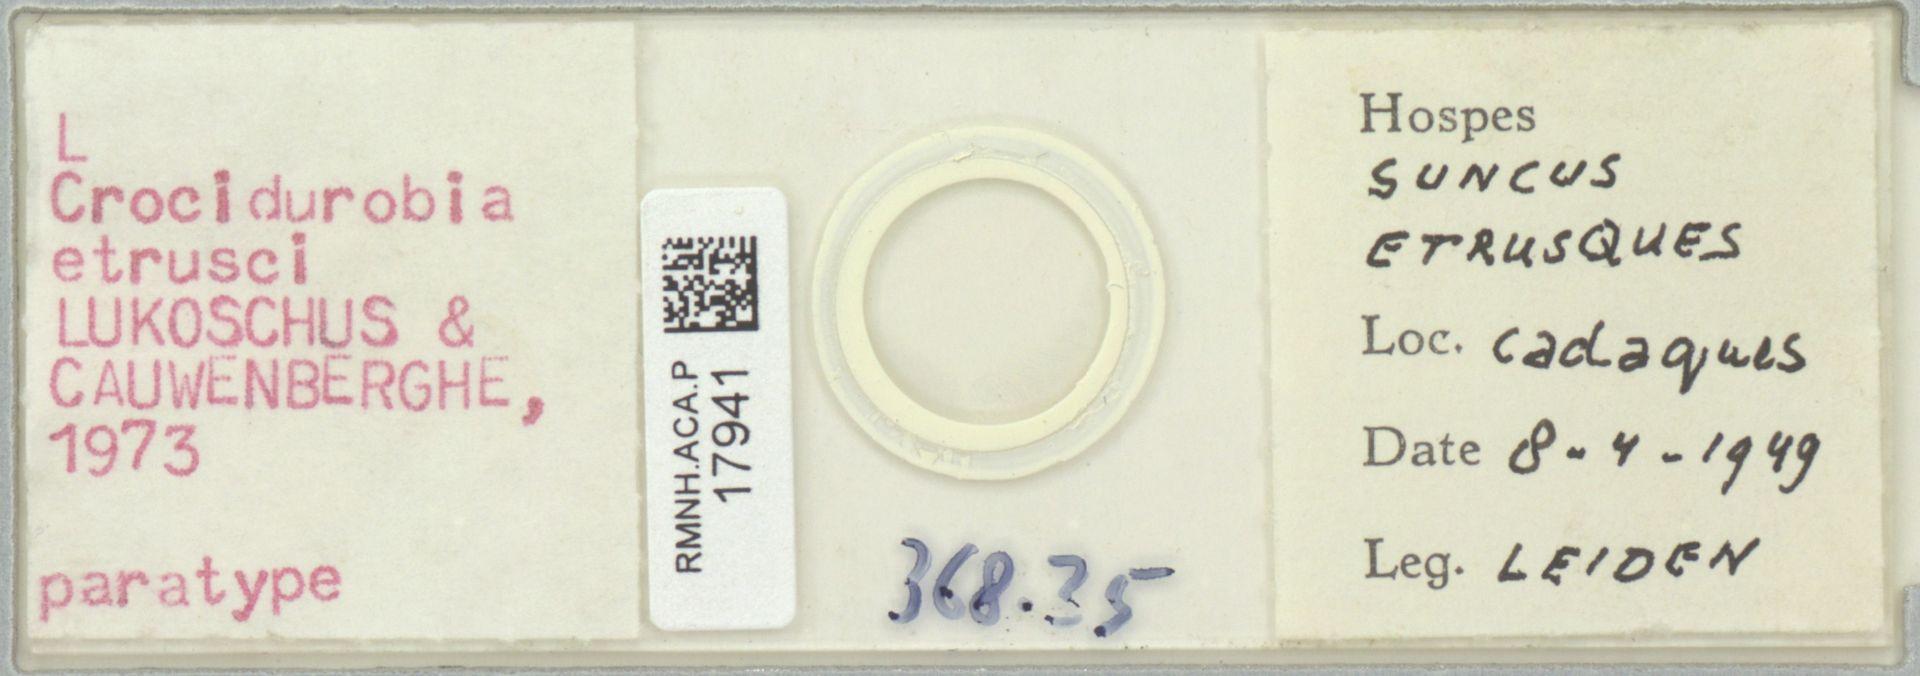 RMNH.ACA.P.17941 | Crocidurobia etrusci Lukoschus & Cauwenberghe, 1973